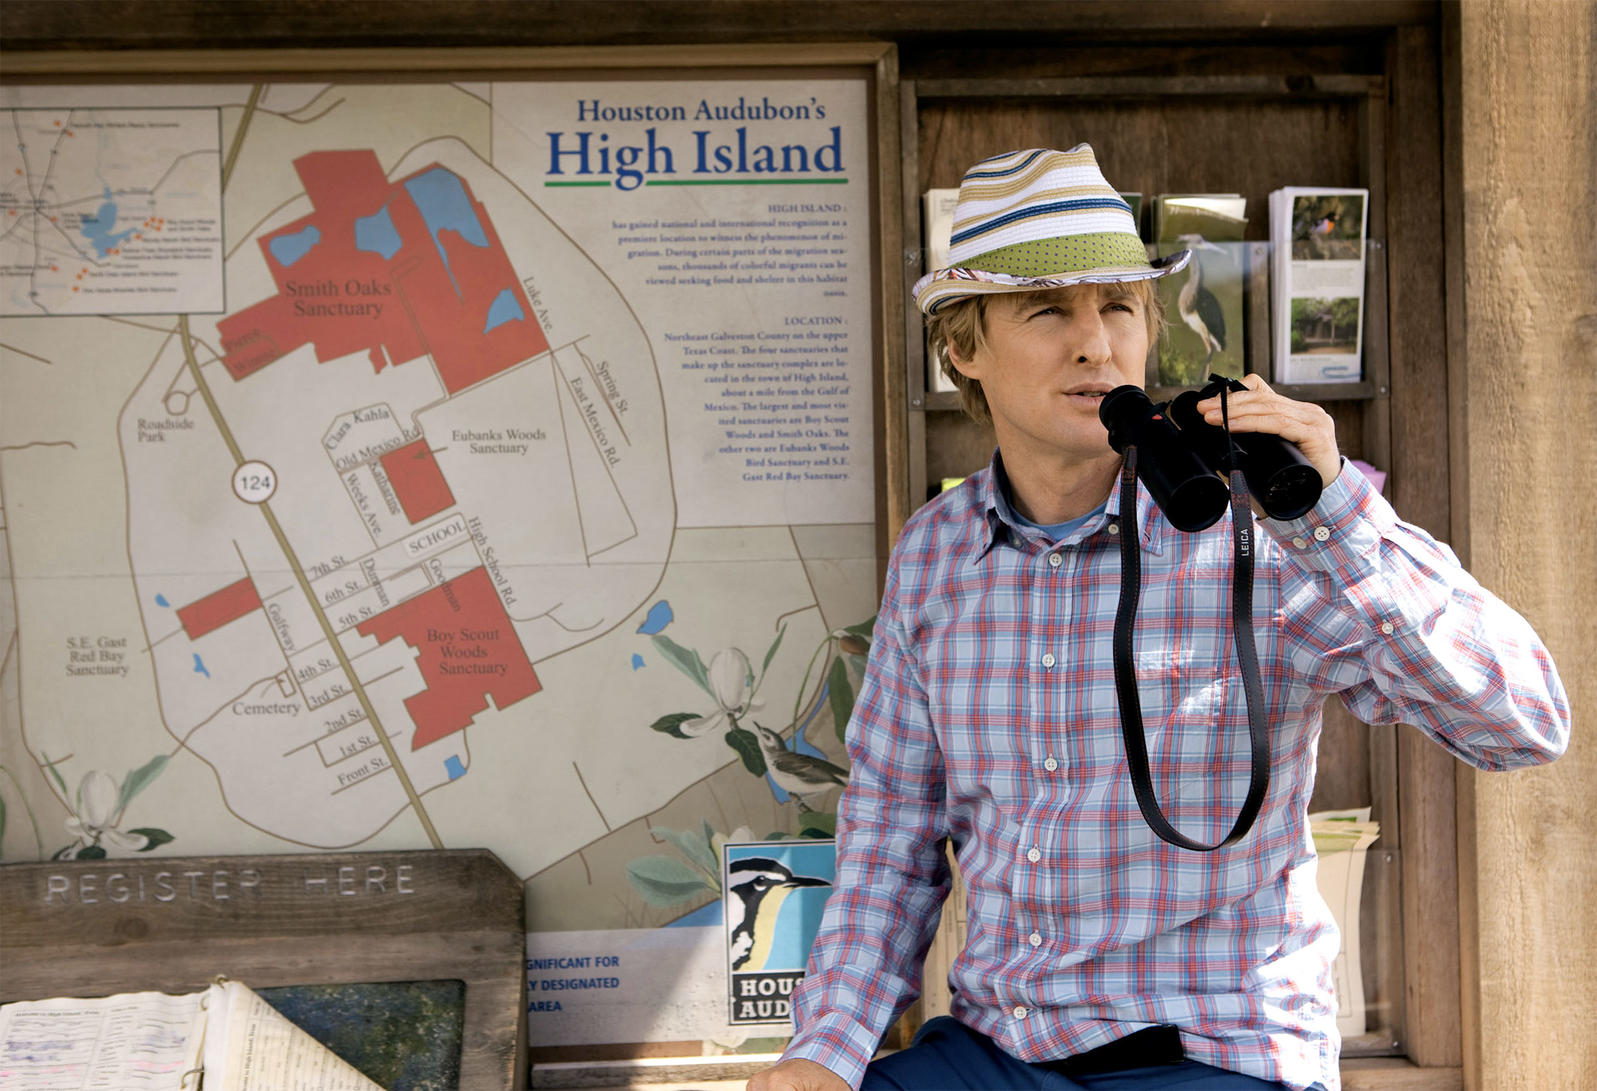 Actor Owen Wilson at Houston Audubon's High Island, a birding hotspot, in The Big Year (2013). AF Archive/Alamy